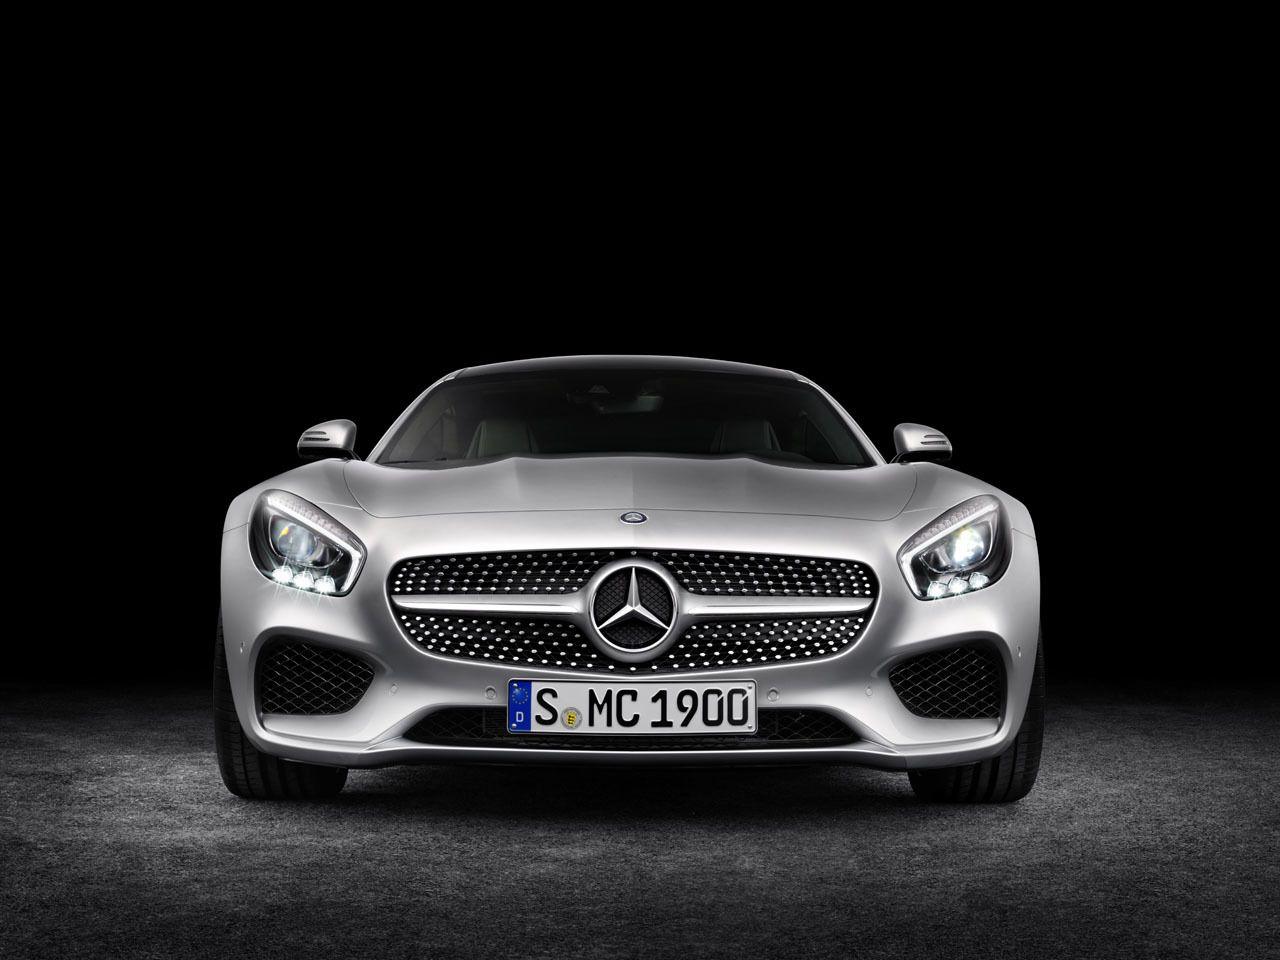 2016 MercedesAMG GT front Mercedes benz, Süper araba